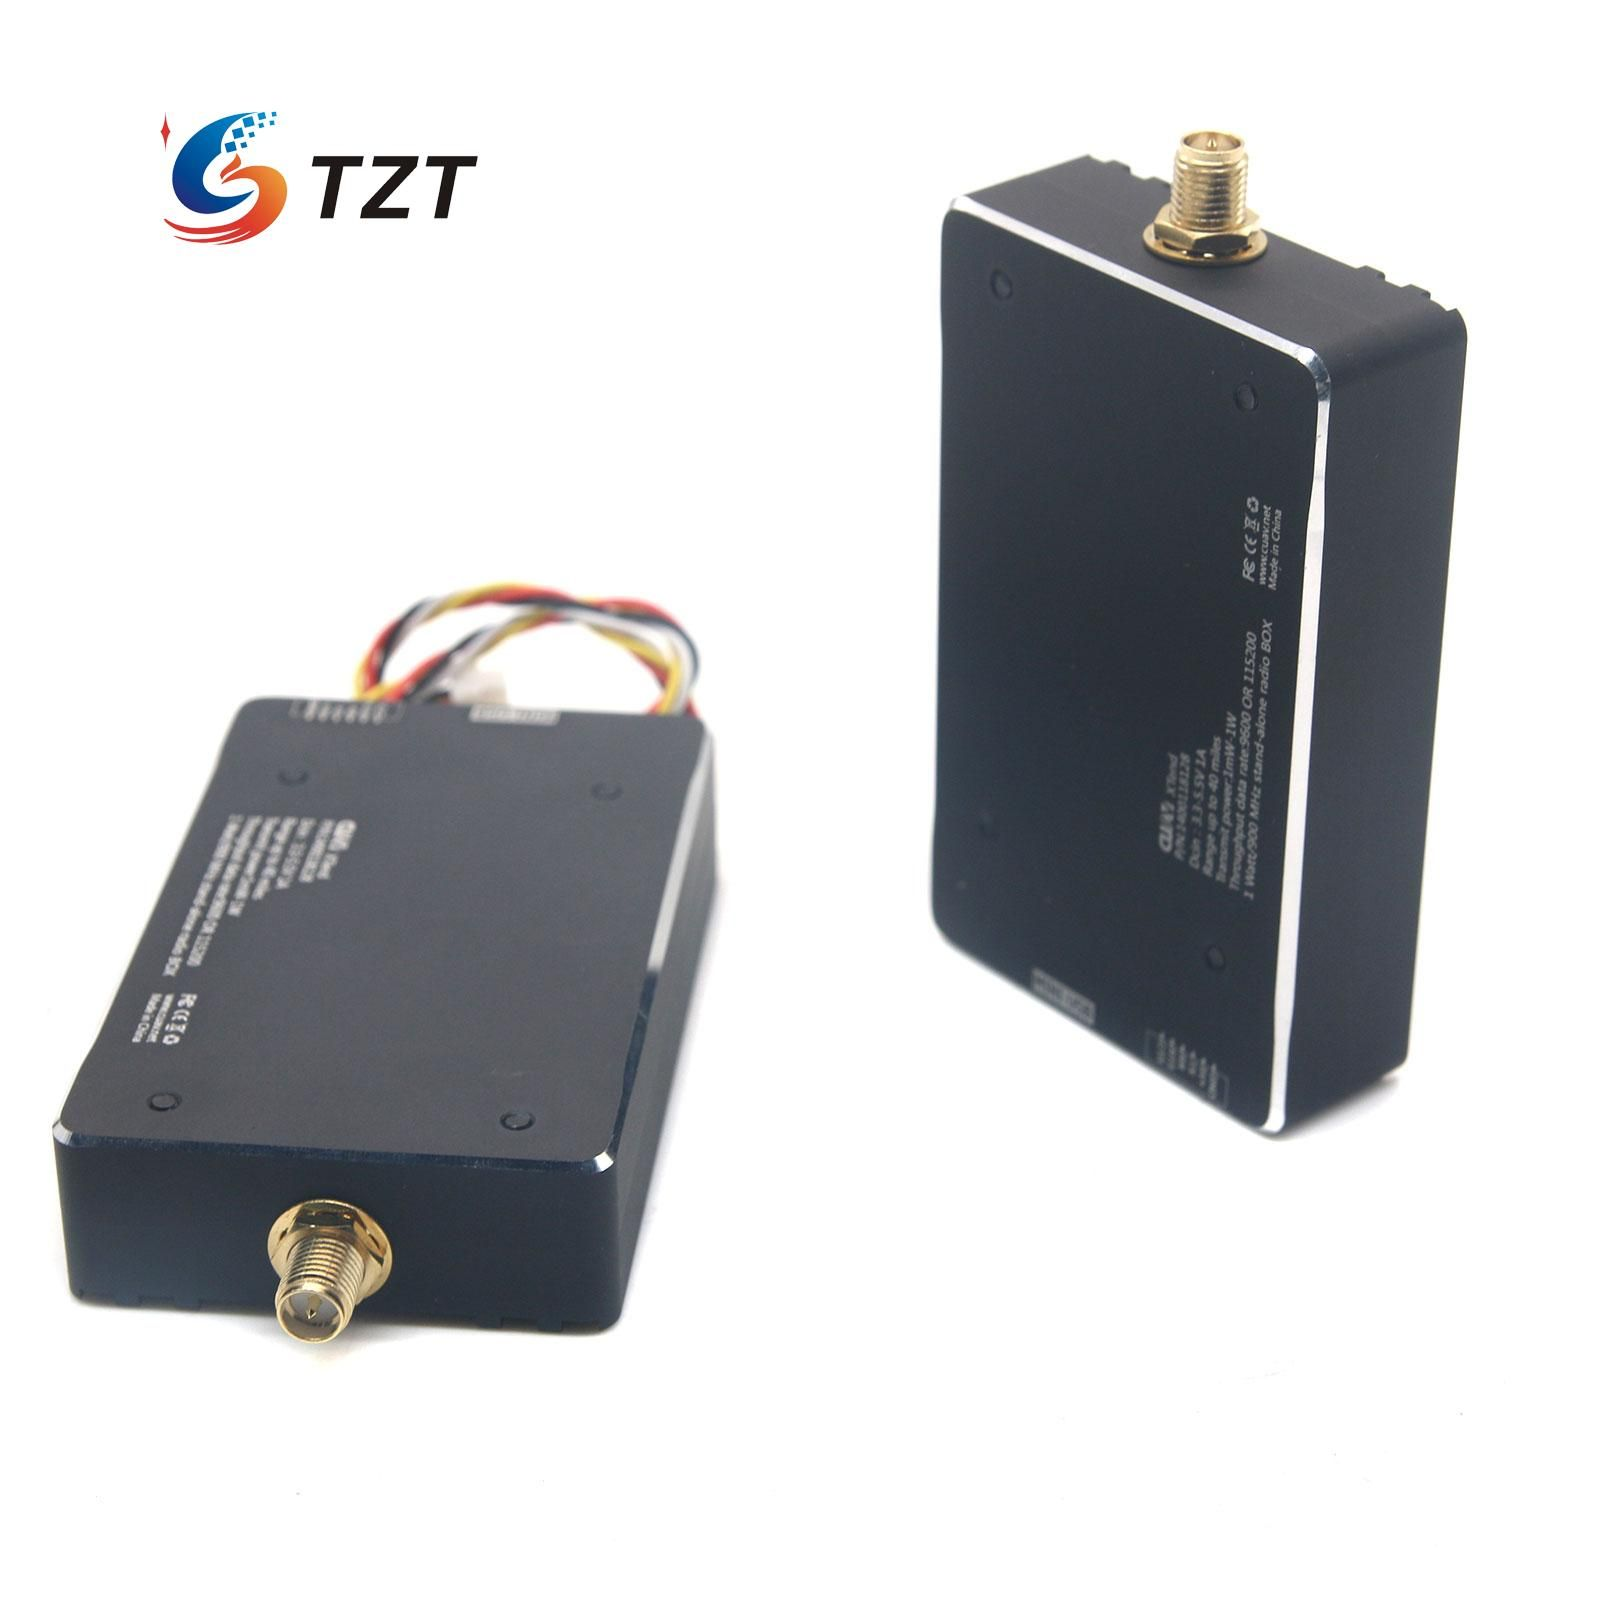 Xtend XTP9B Wireless Data Transmission Module Kit RF Box 900mAh 1W for APM Pixhawk Pixhack Flight Controller